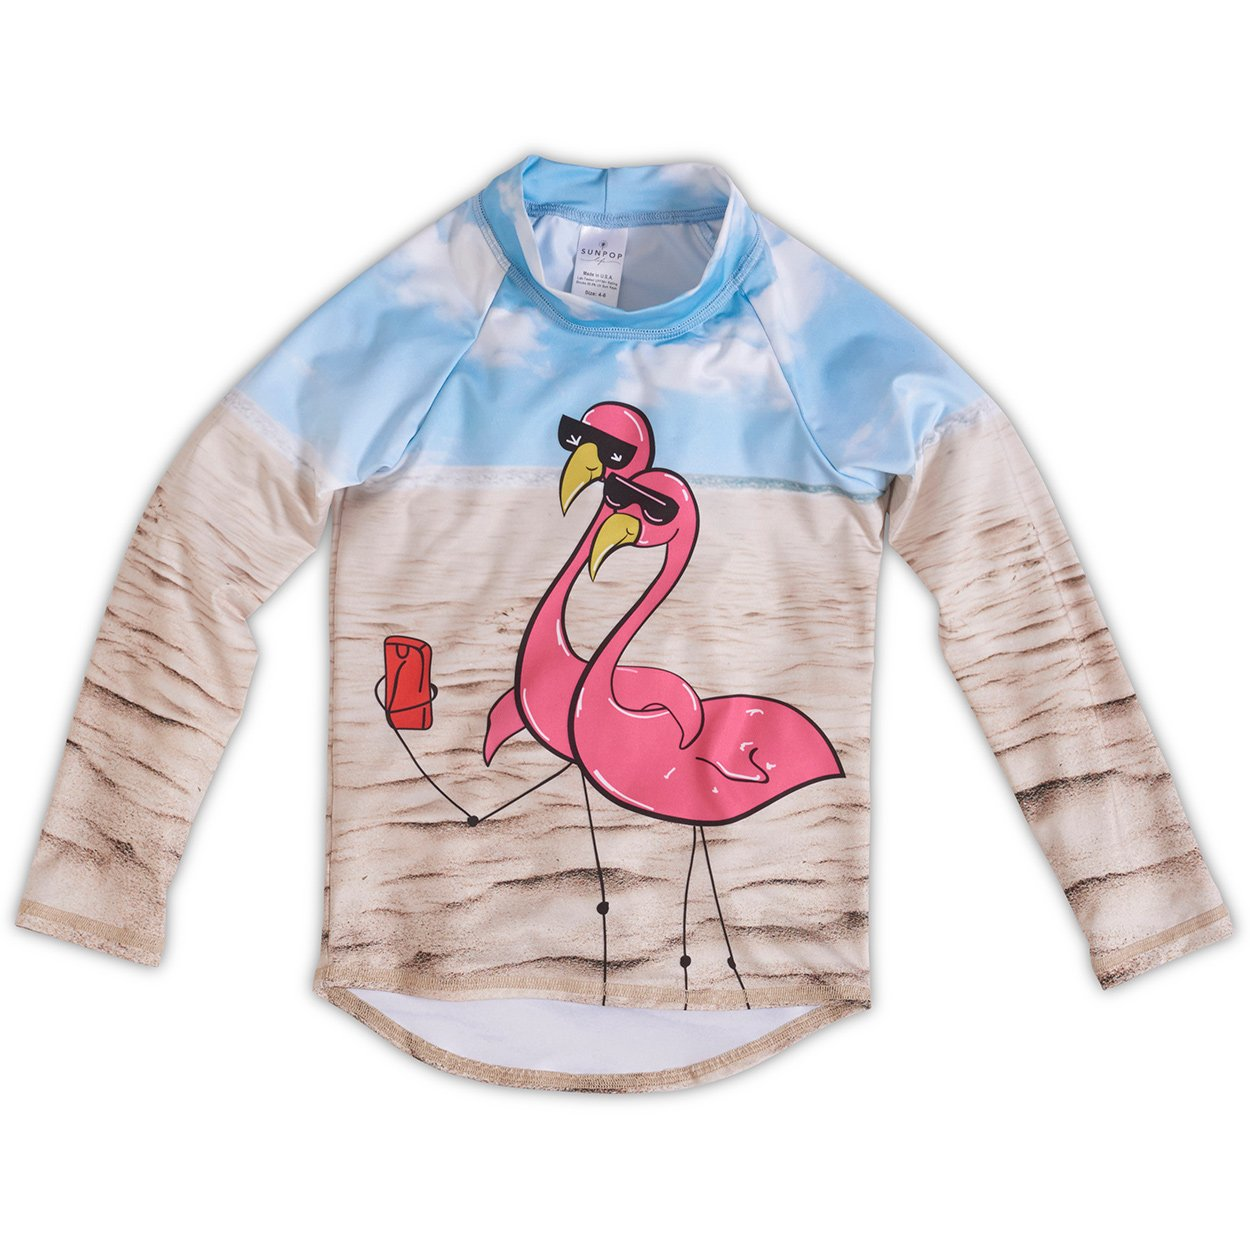 Flamingo Rash Guard Top Girls Sunpoplife